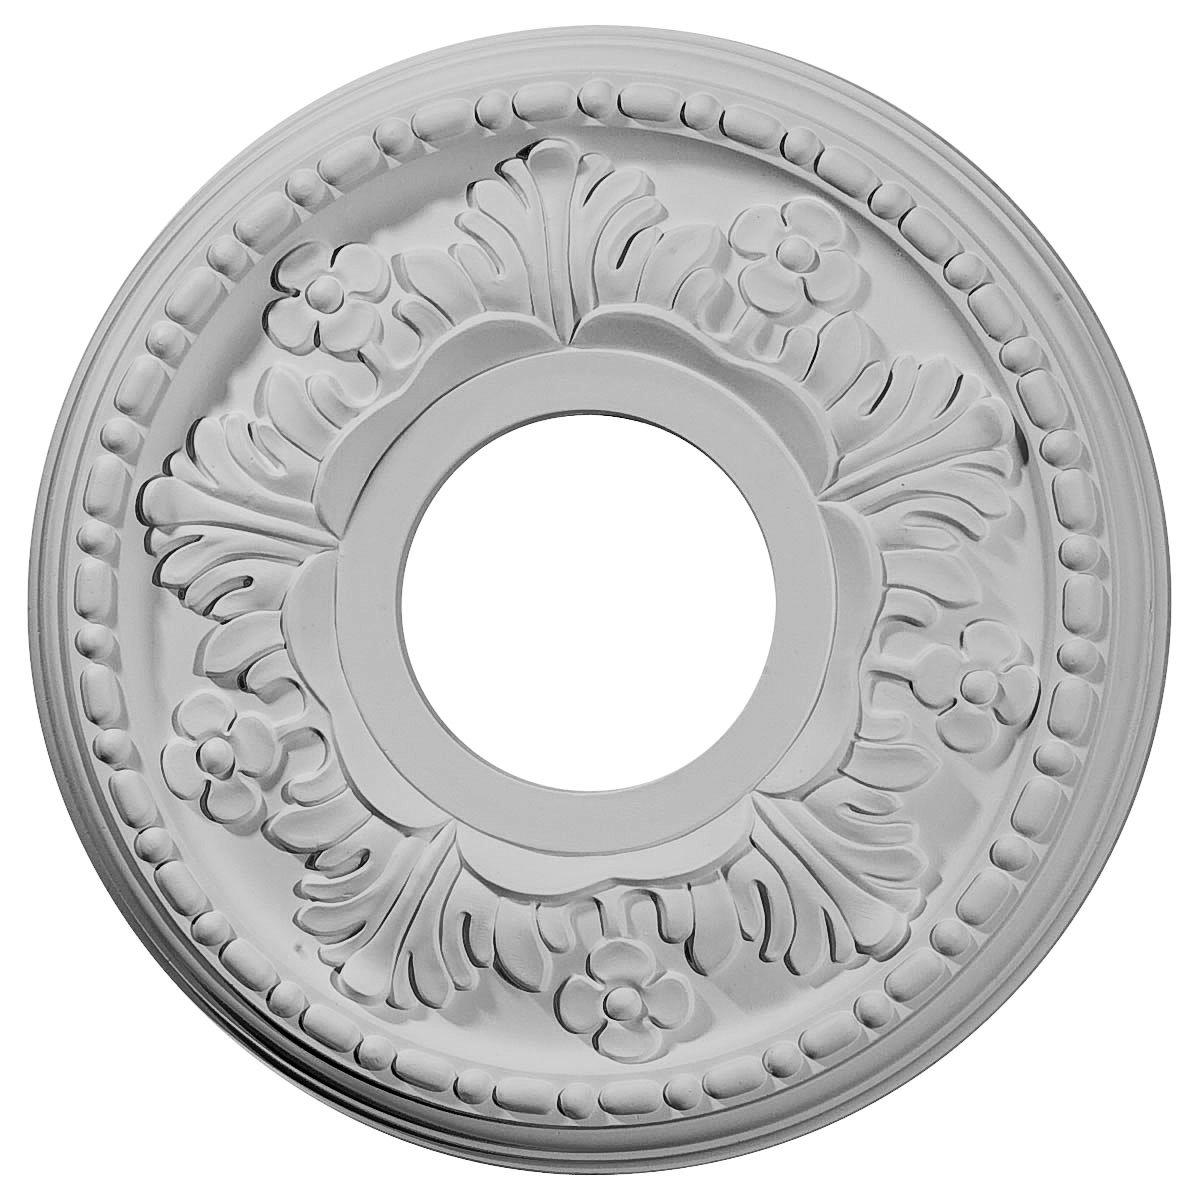 Ekena Millwork CM11HE 11 7/8-Inch OD x 3 5/8-Inch ID x 7/8-Inch Helene Ceiling Medallion